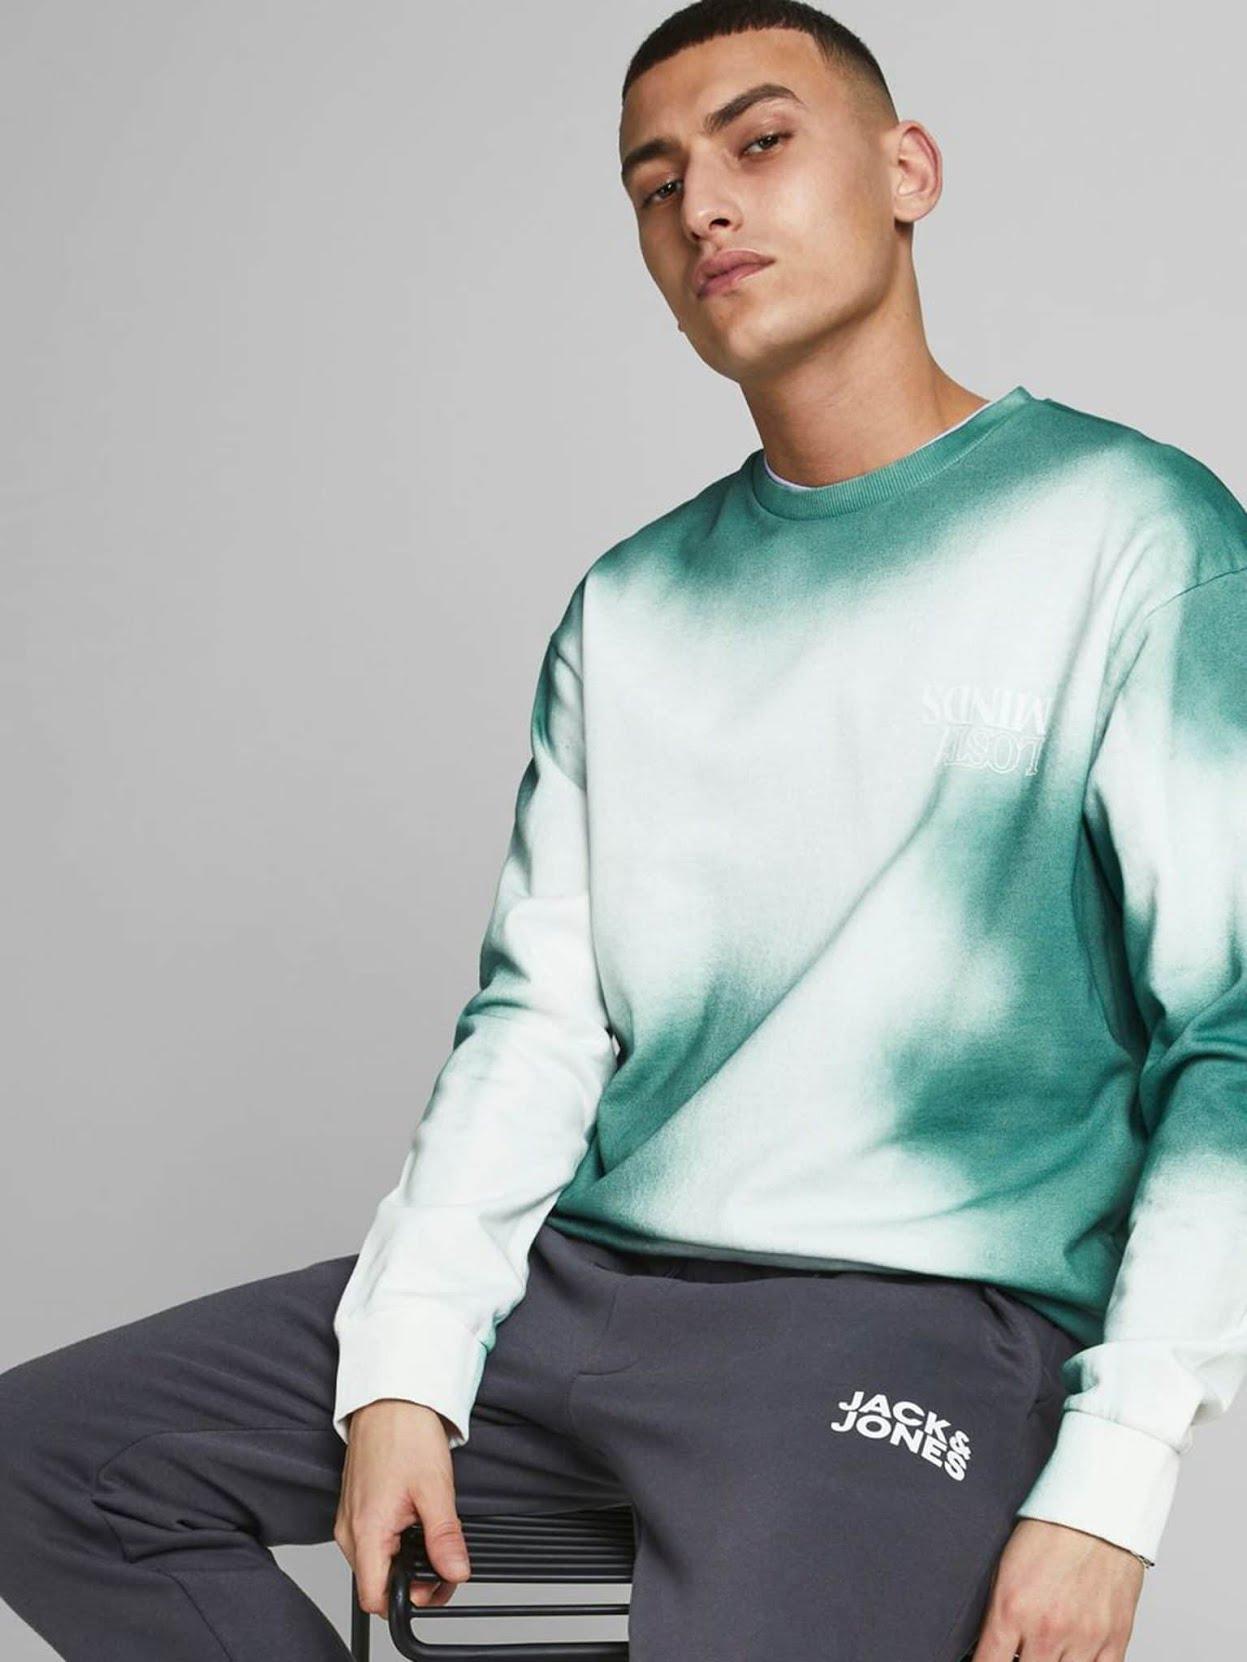 Avis Jack & Jones - sweat-shirt tie & dye